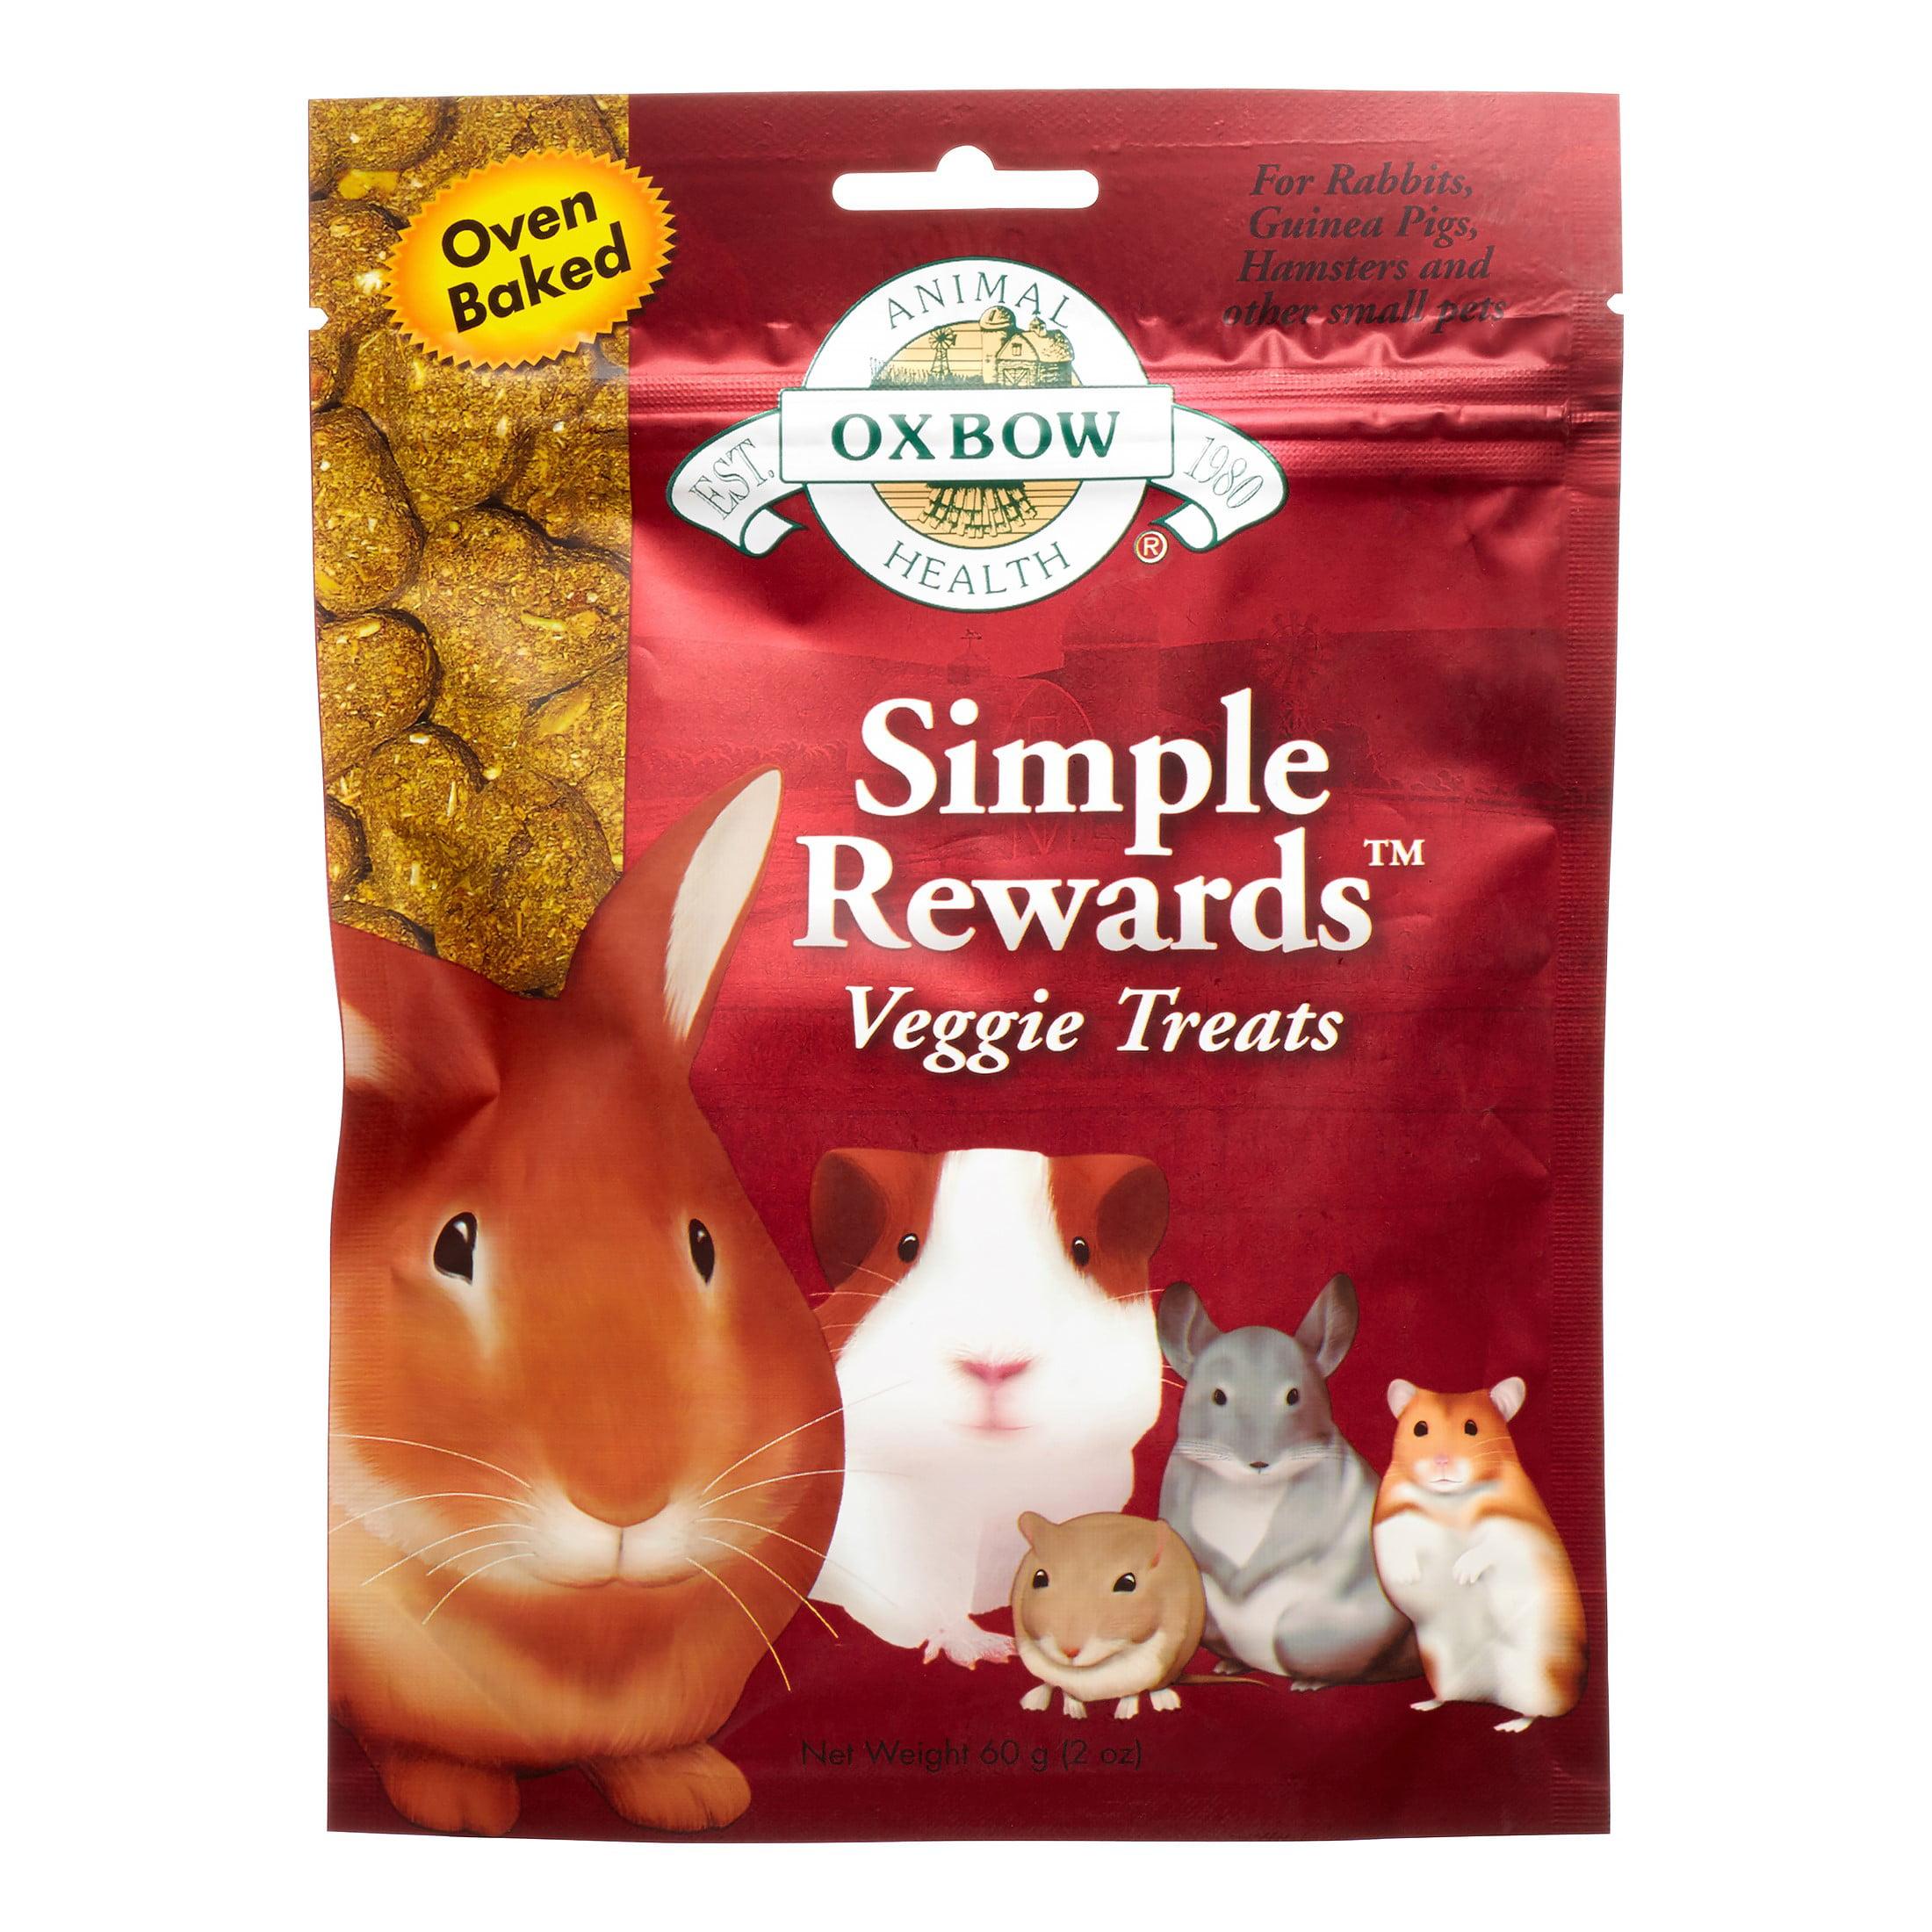 Oxbow Simple Rewards Small Animal Treats, Veggie, 2 oz.